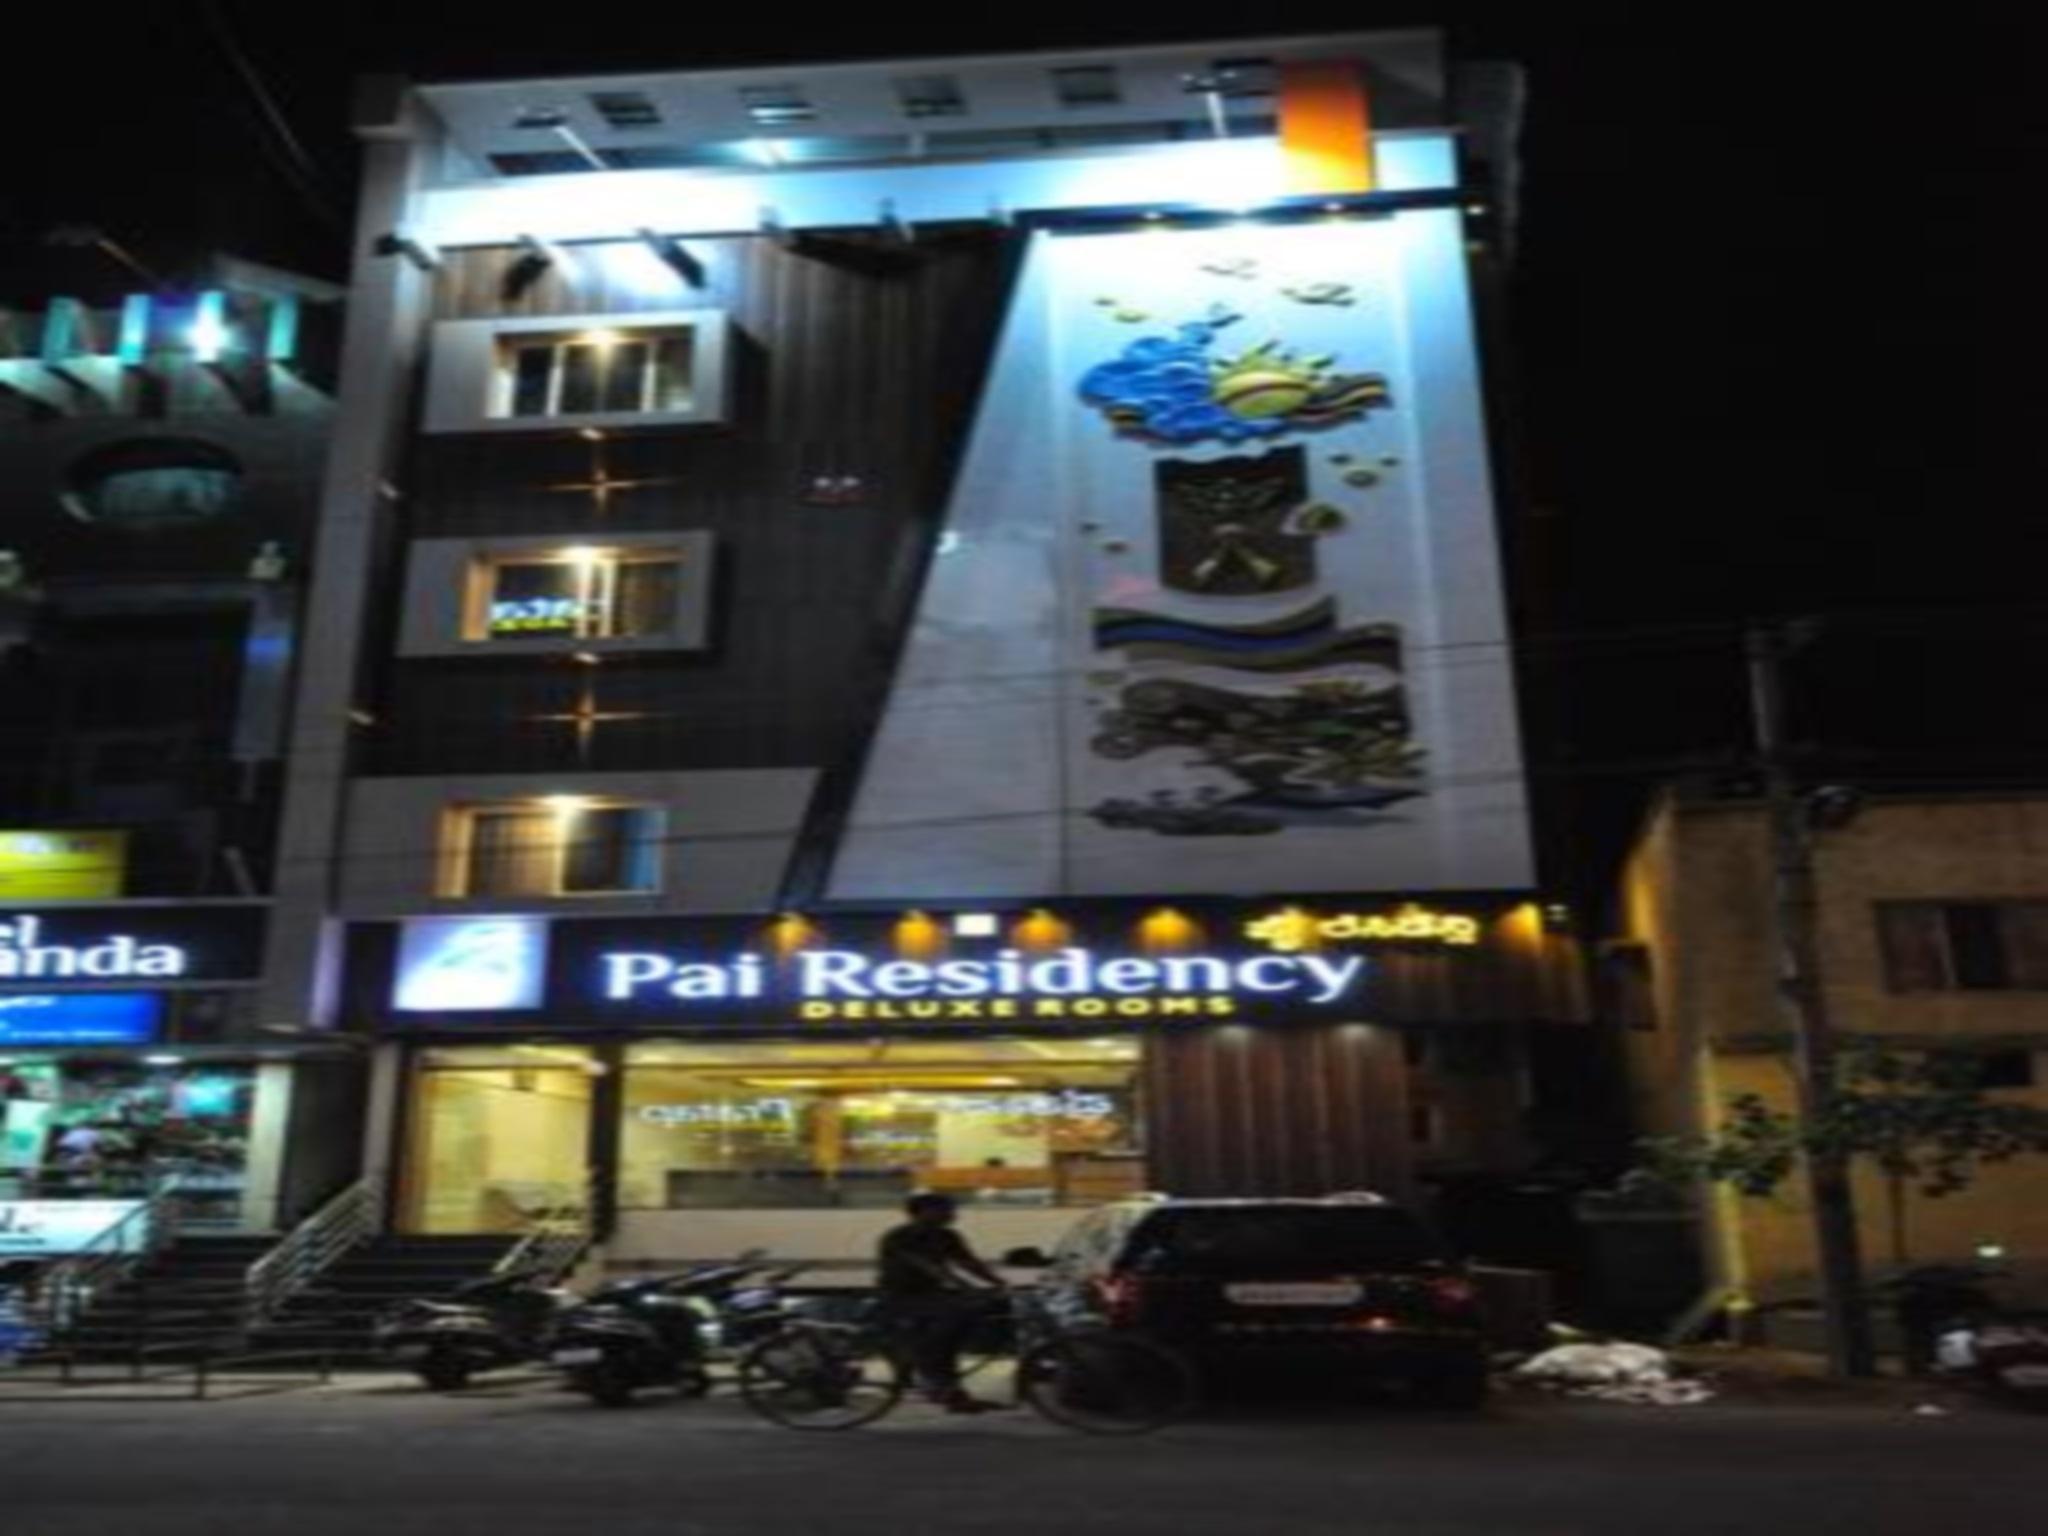 Pai Residency, Bellary